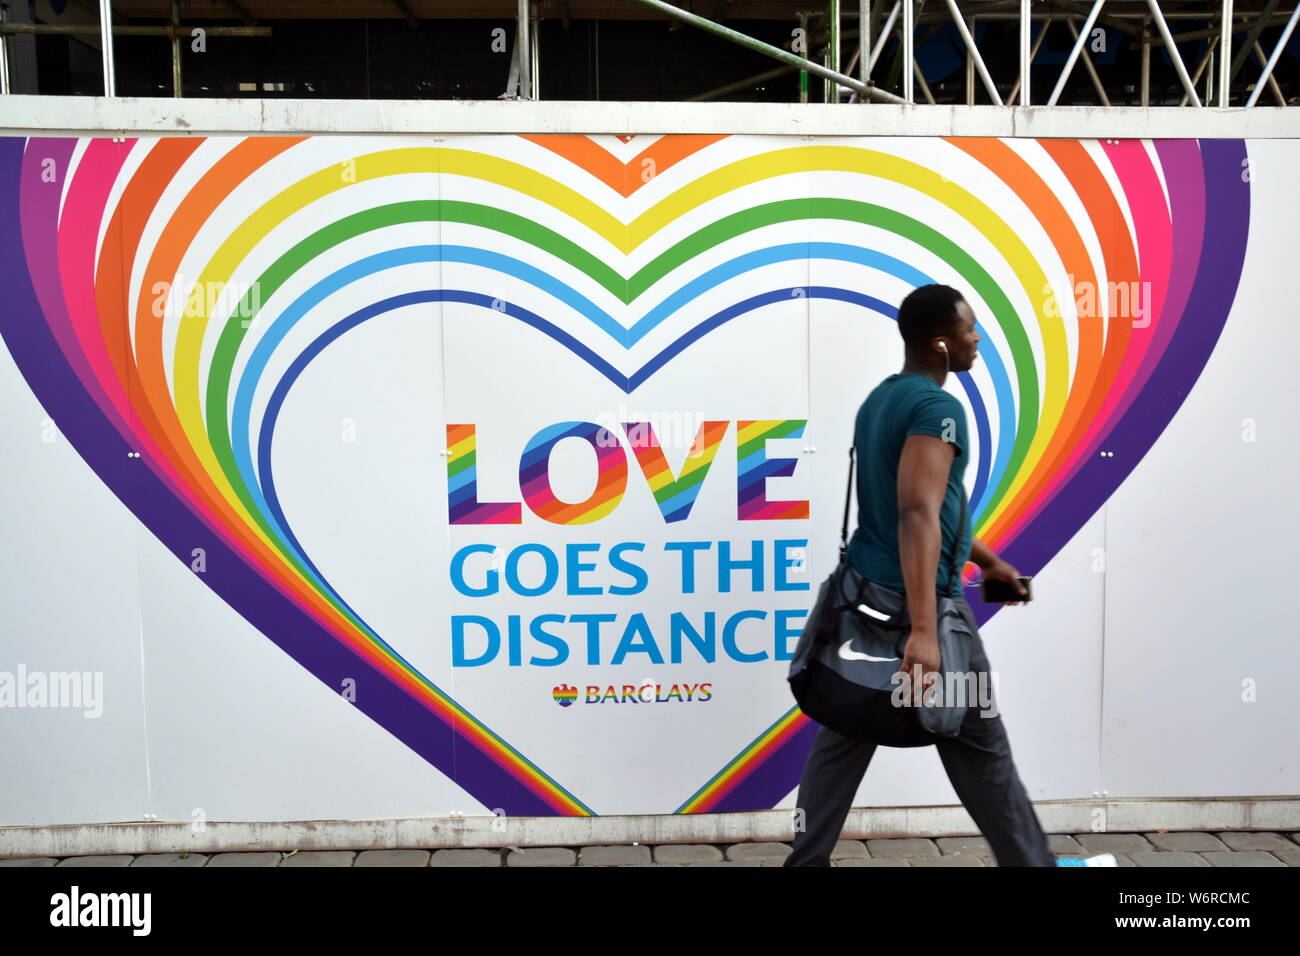 A man walks past a rainbow themed 'Love Goes the Distance